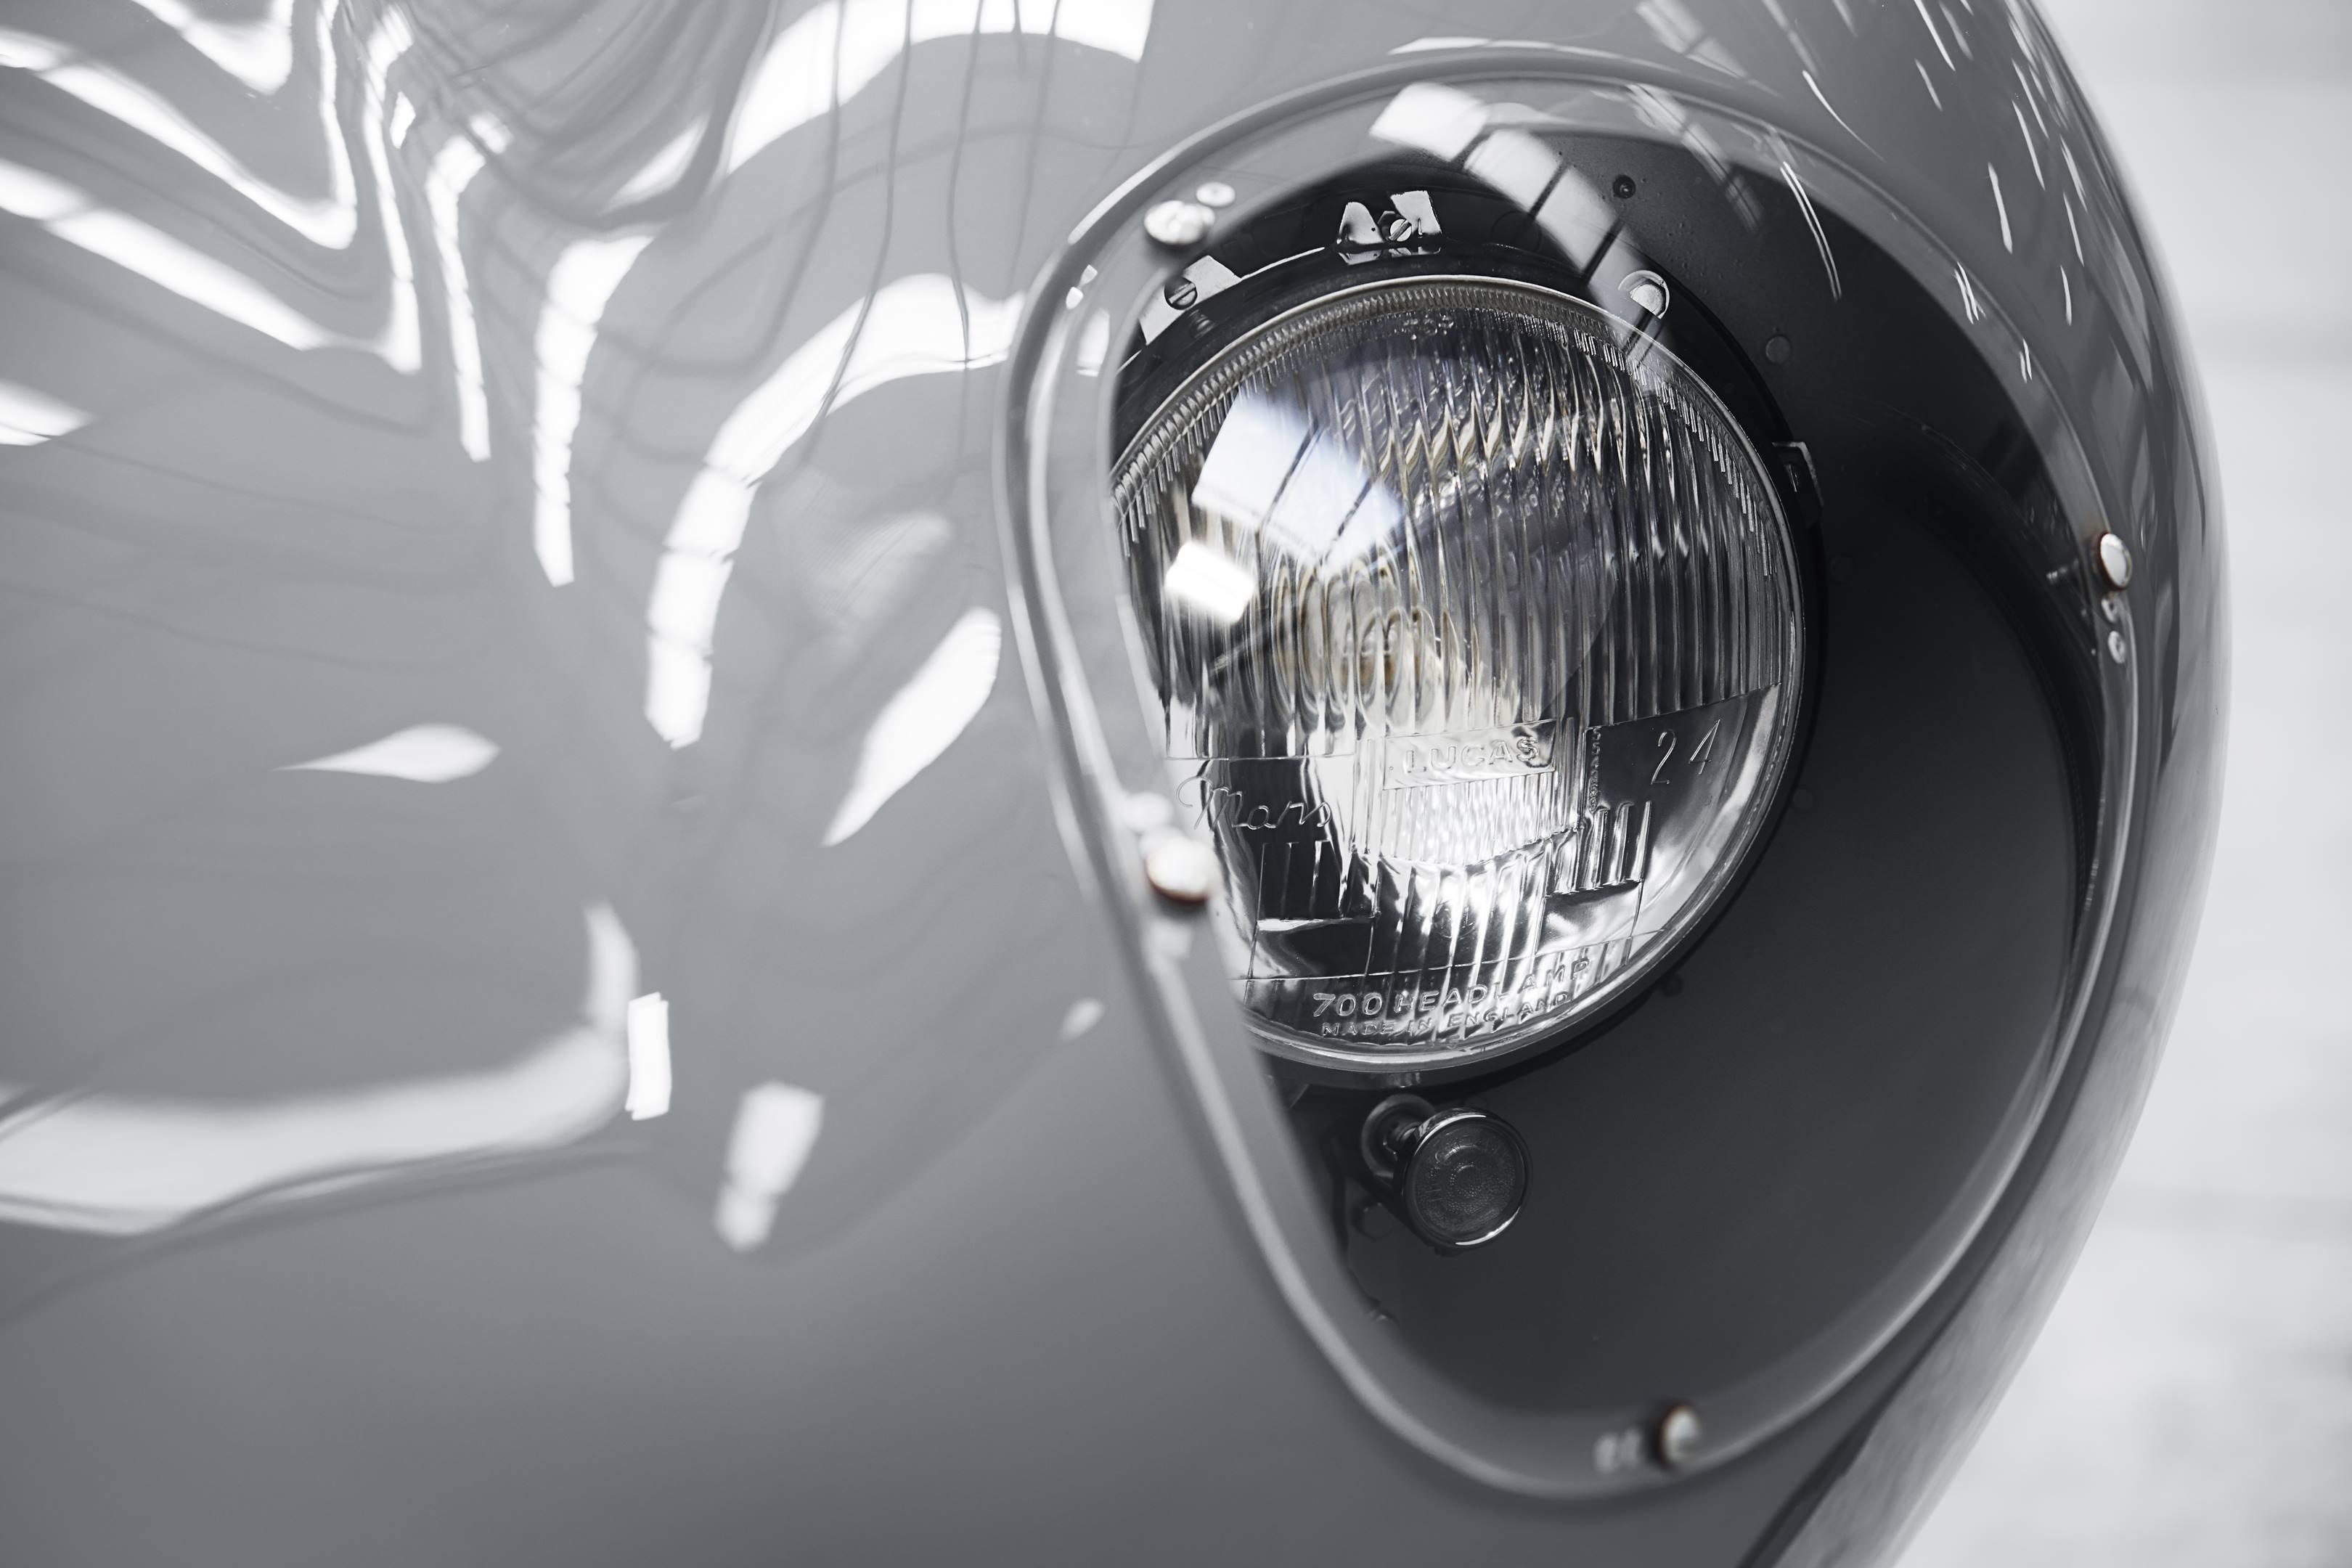 Jaguar D-type headlight